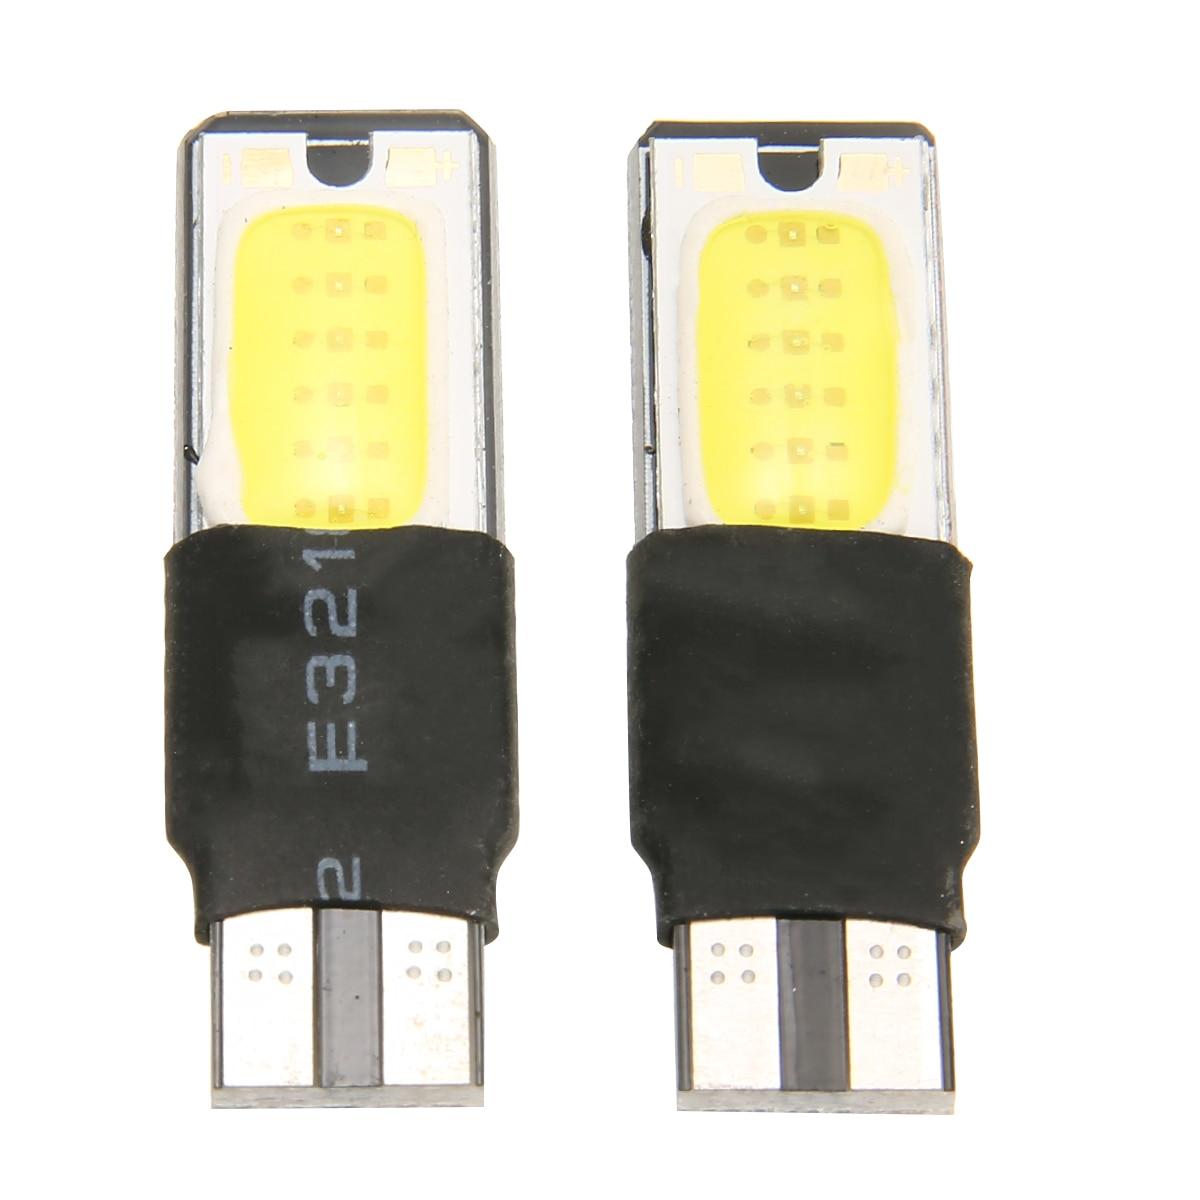 2PCS T10 194 168 6W COB LED Car Canbus No Error Wedge Side Light Bulb White Lamp Car Styling Signal Side Marker Lights